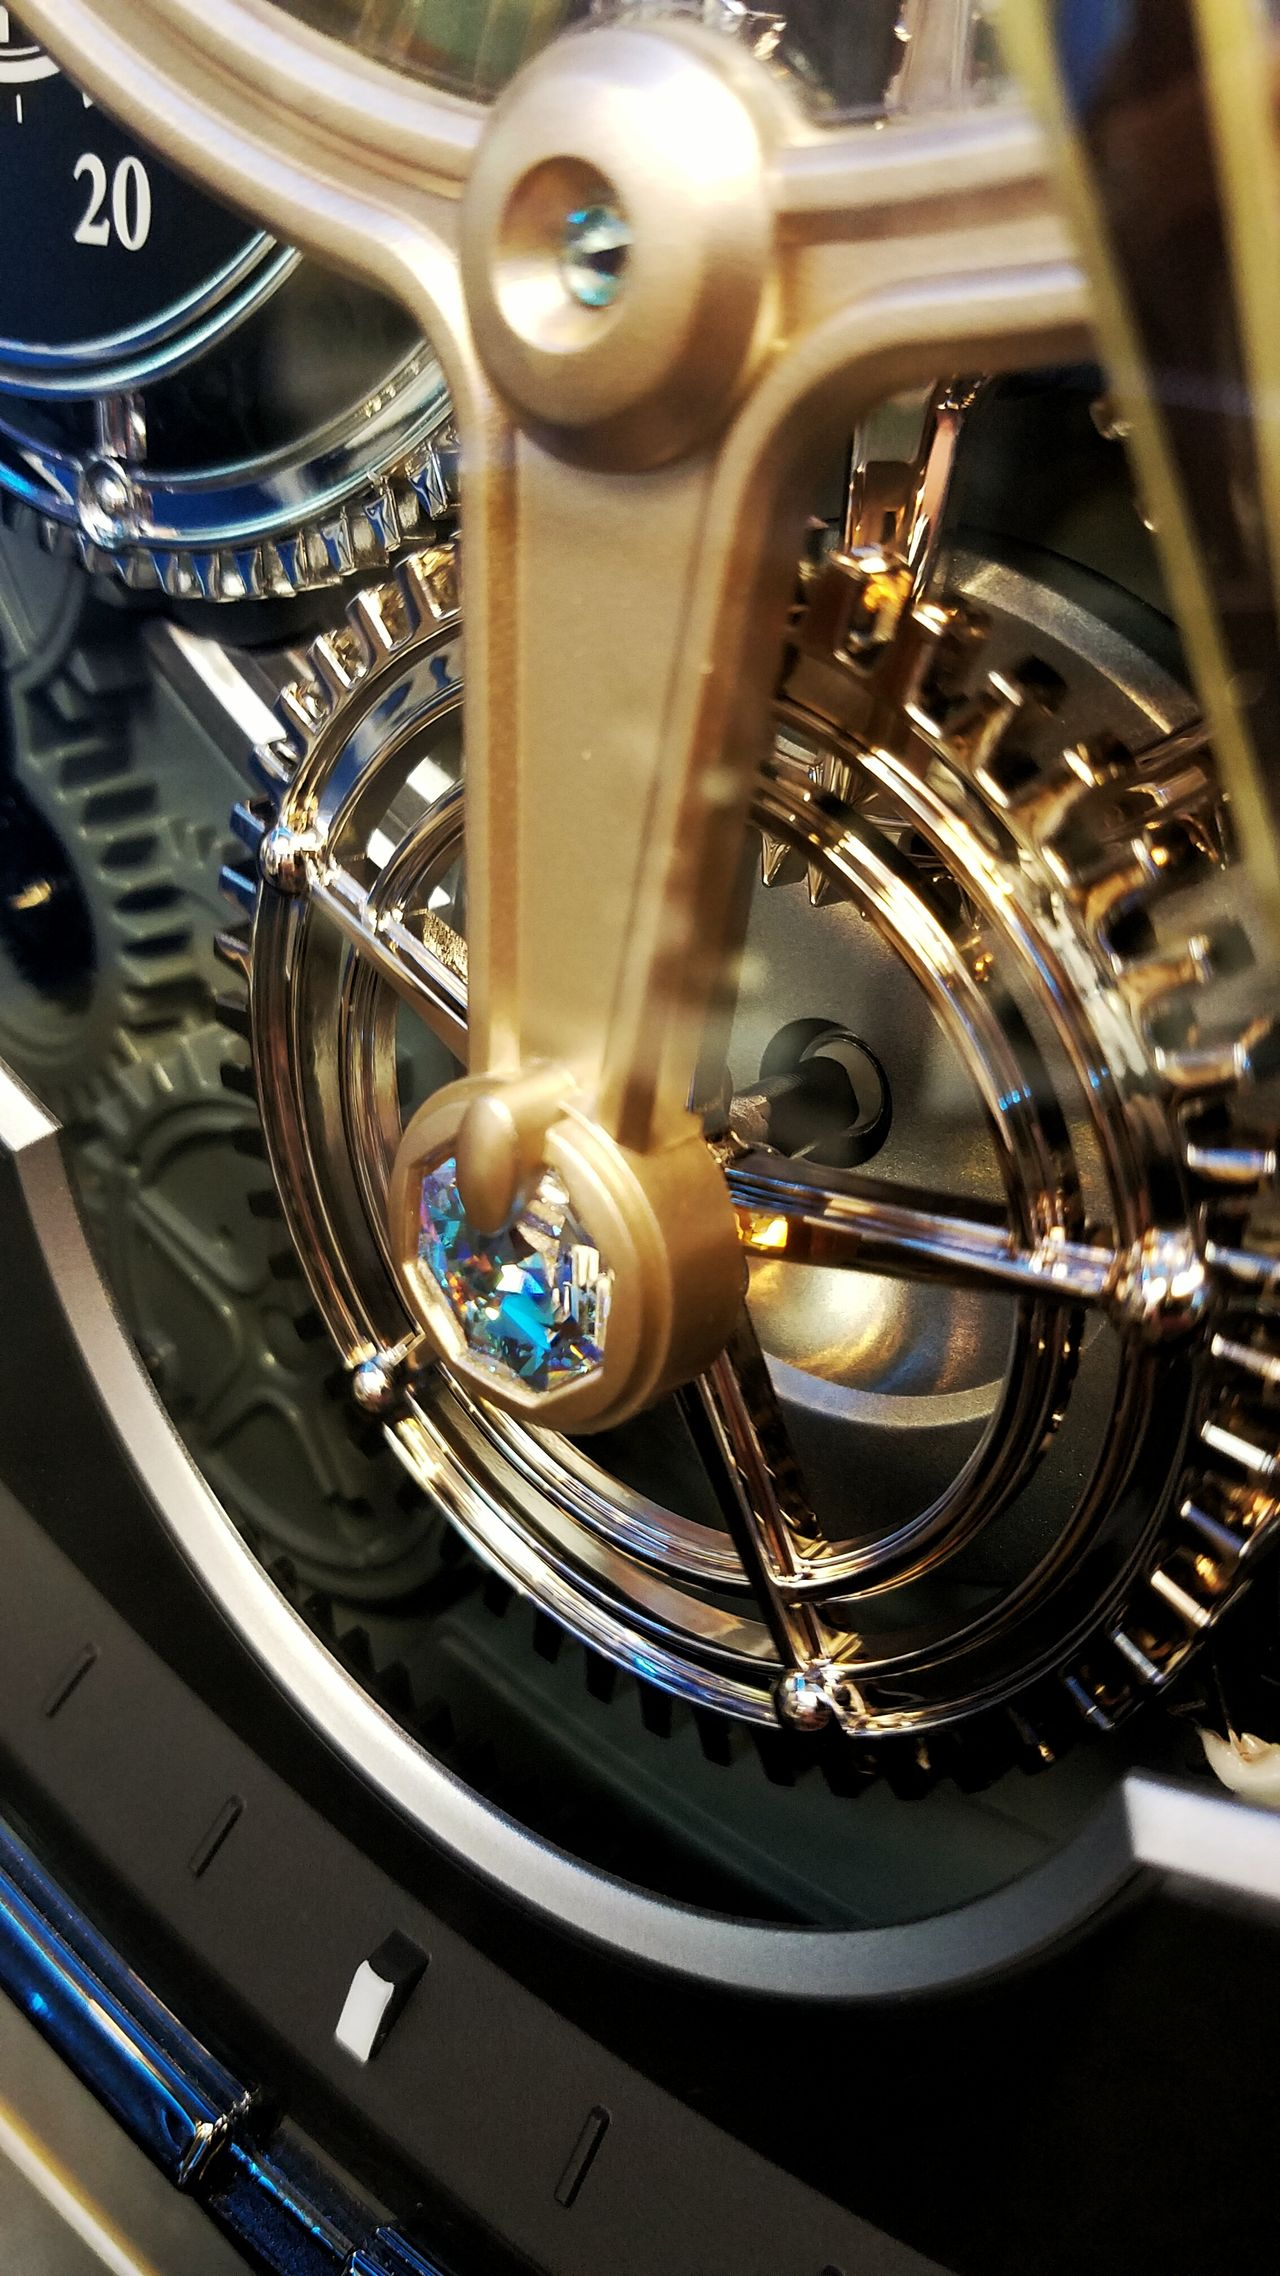 Clock Gear Gears Clocks Clock Face Clock Watching Watch Watches Colorful Time Times Ticking Tick Tock Tick Tock BestofEyeEm Checkthisout